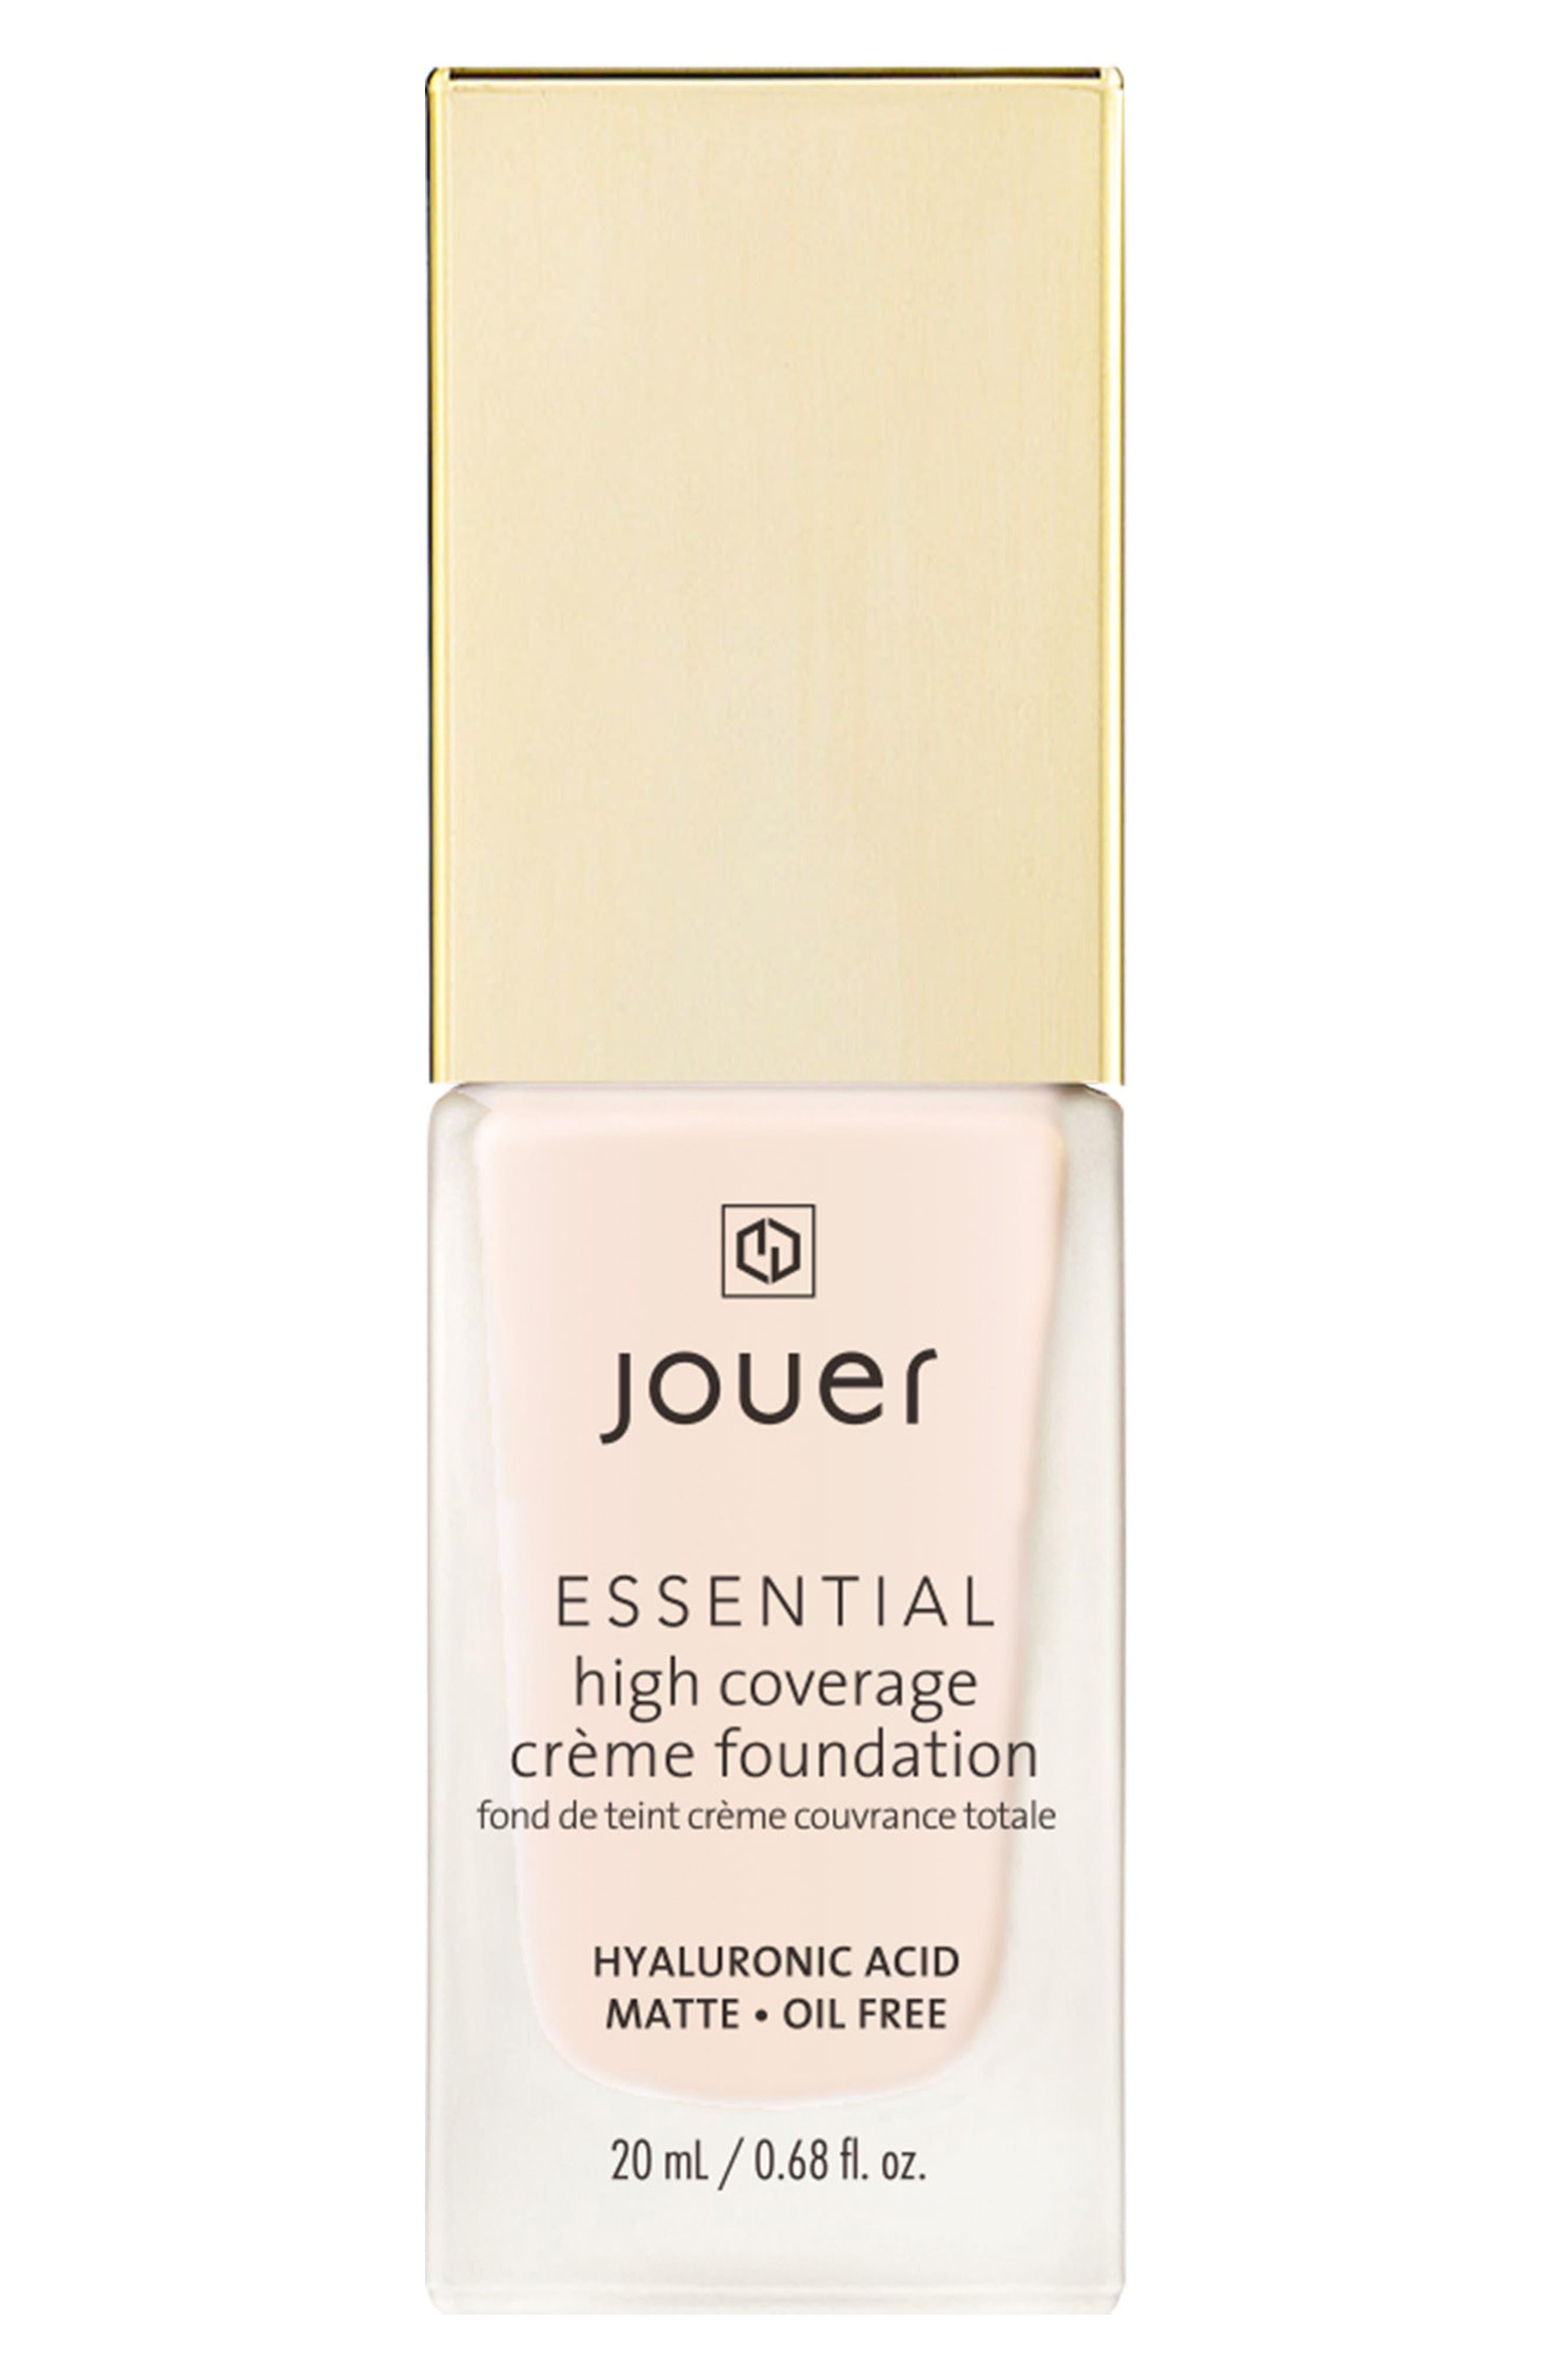 Jouer Essential High Coverage Crème Foundation